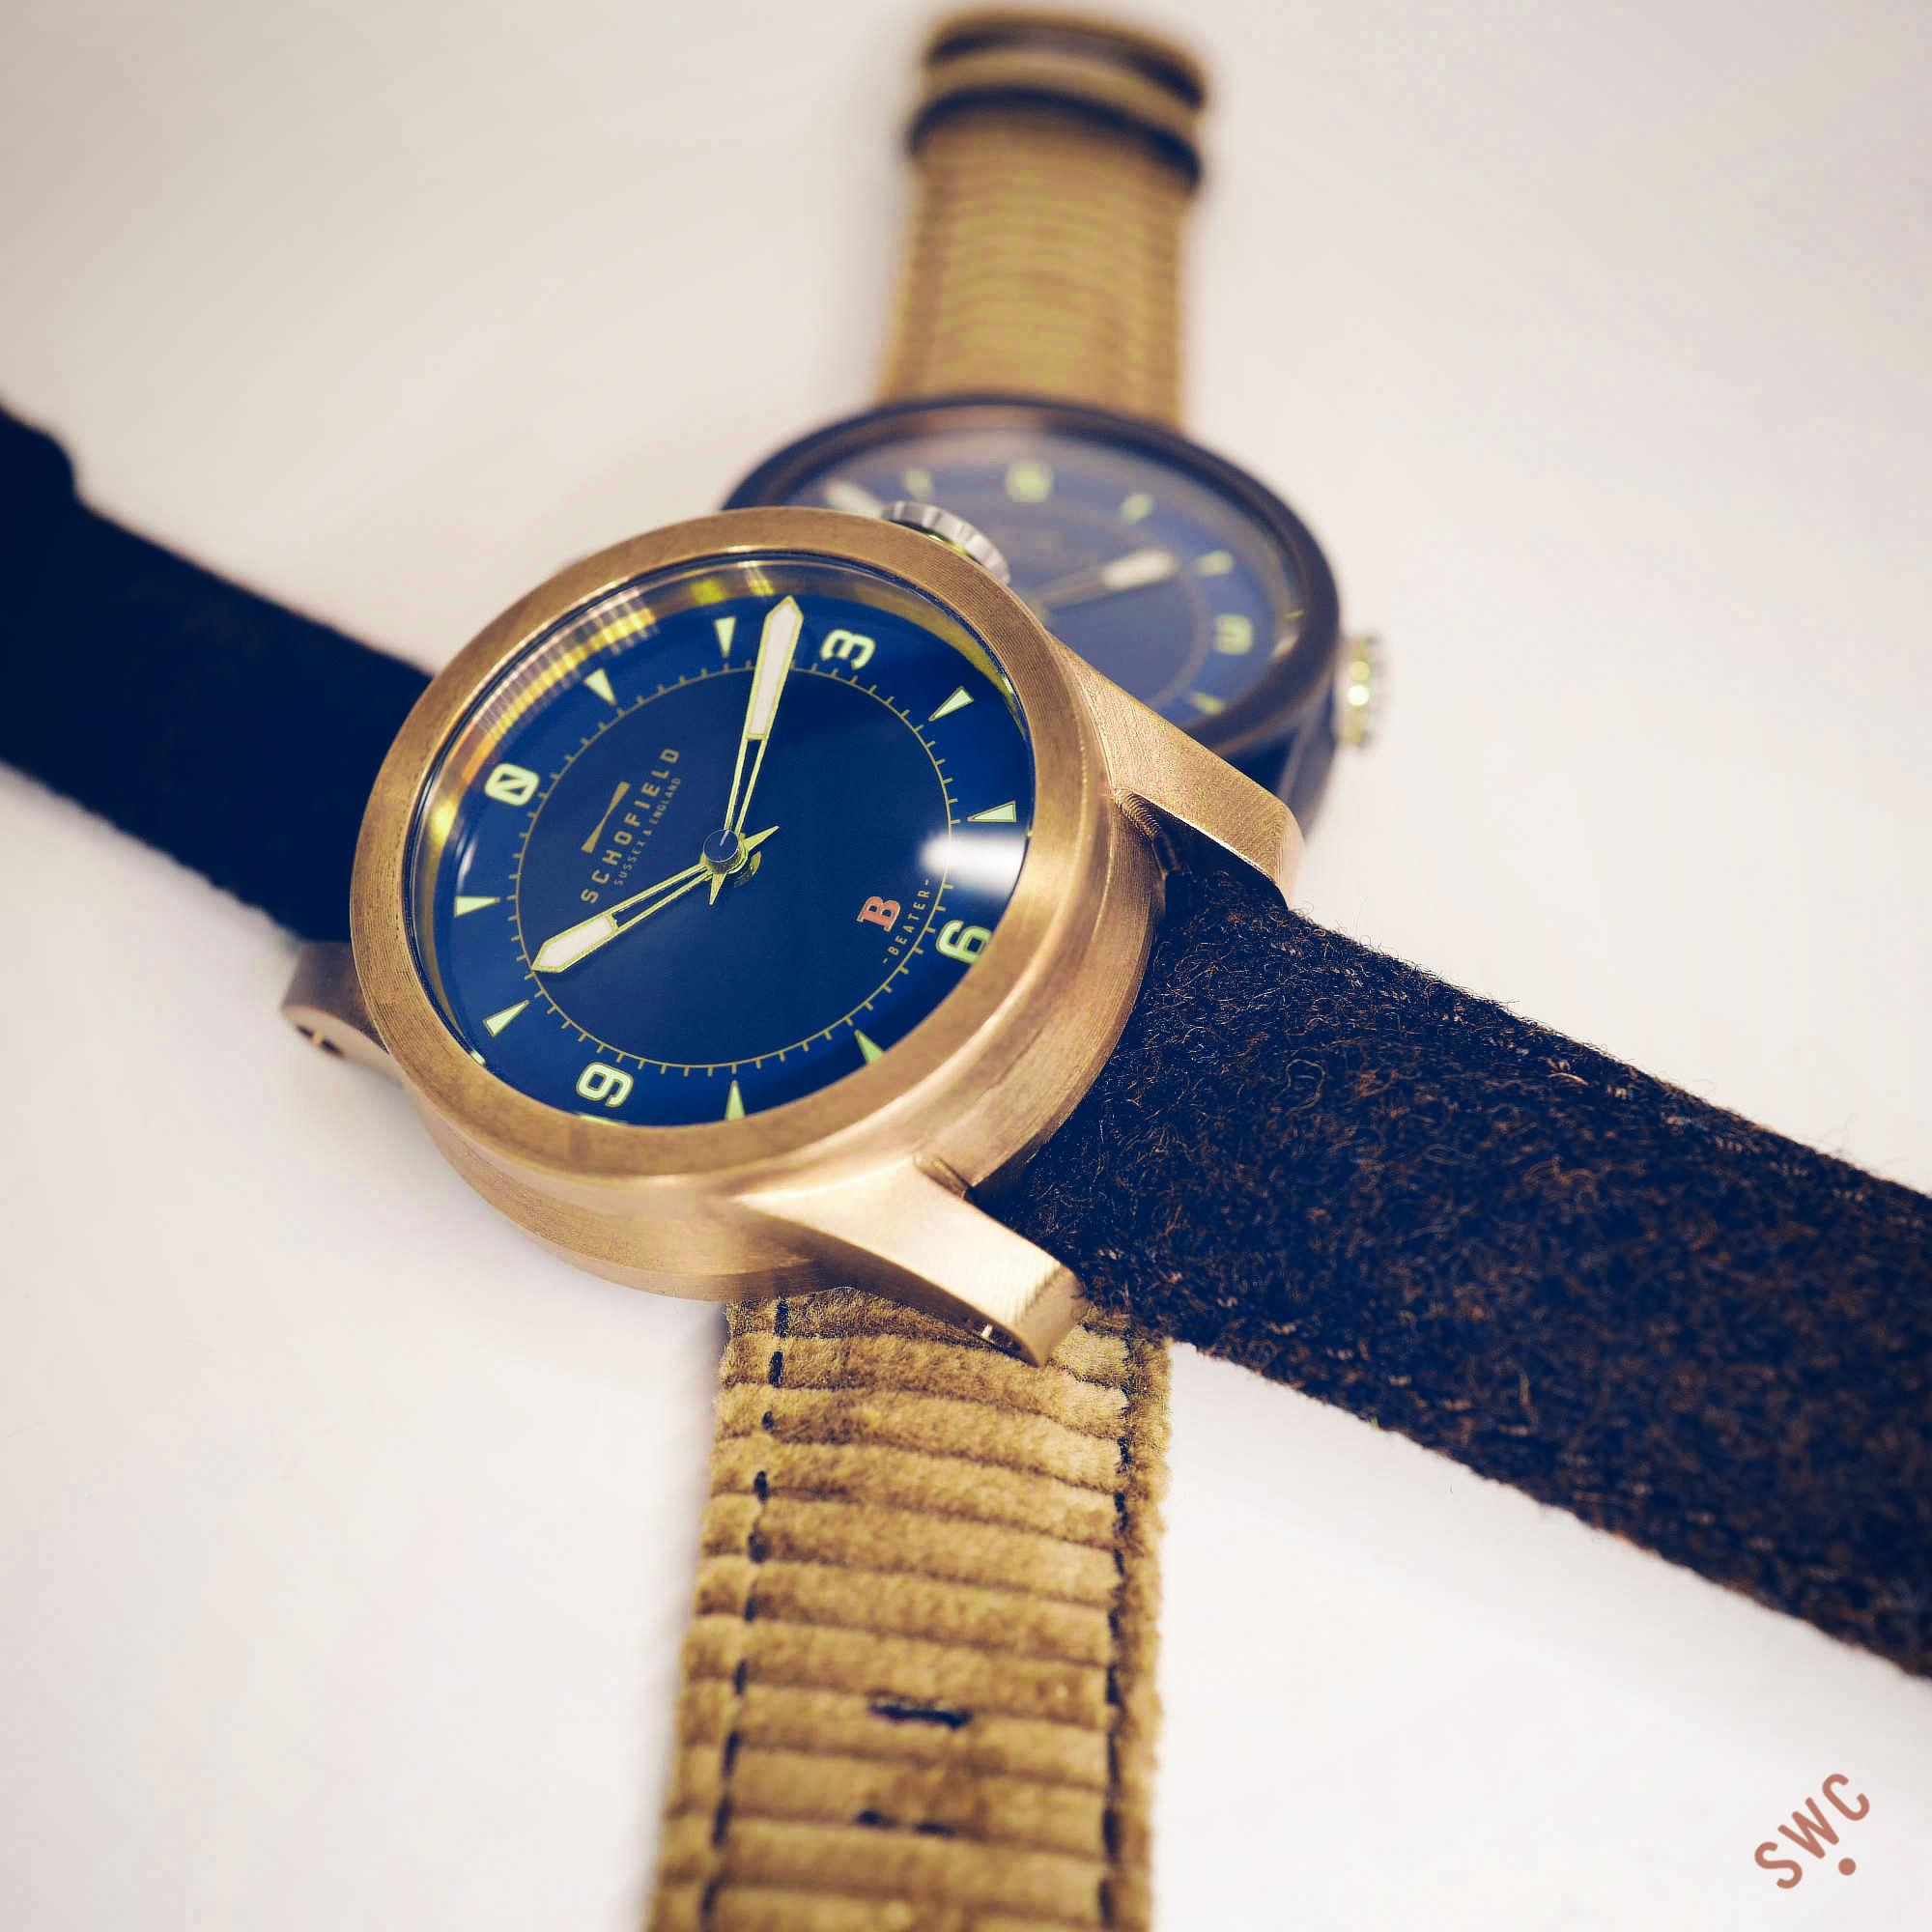 Bronze watches made in Britain